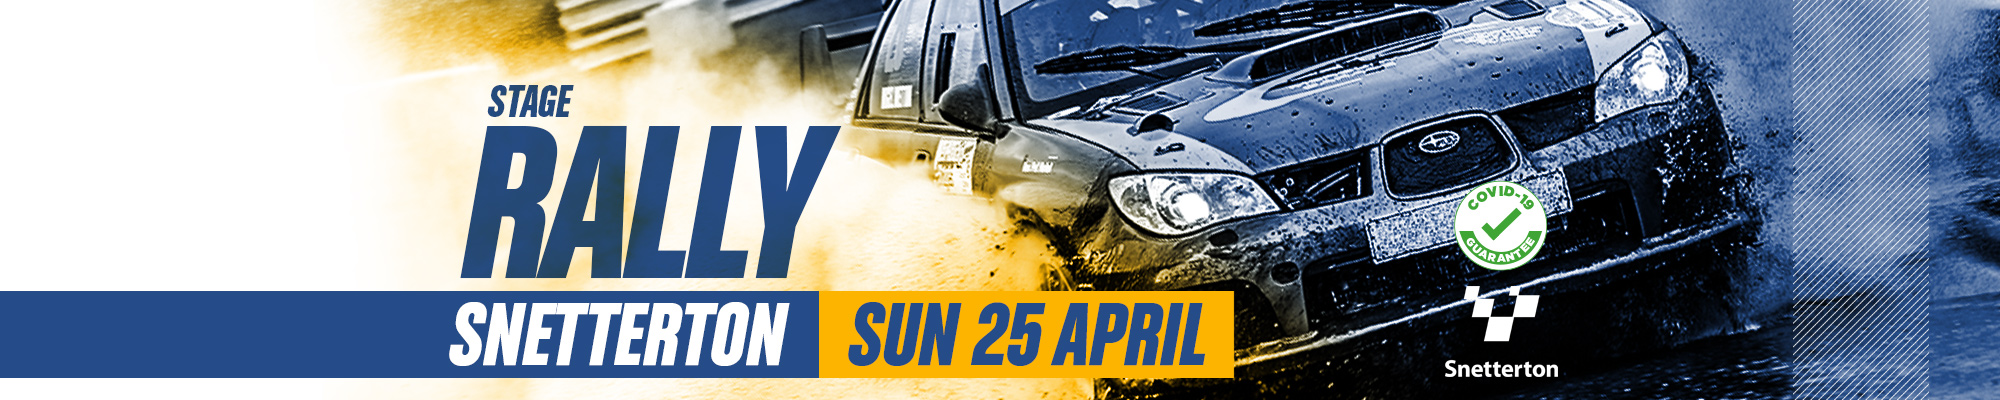 Snetterton Stage Rally - NO SPECTATORS